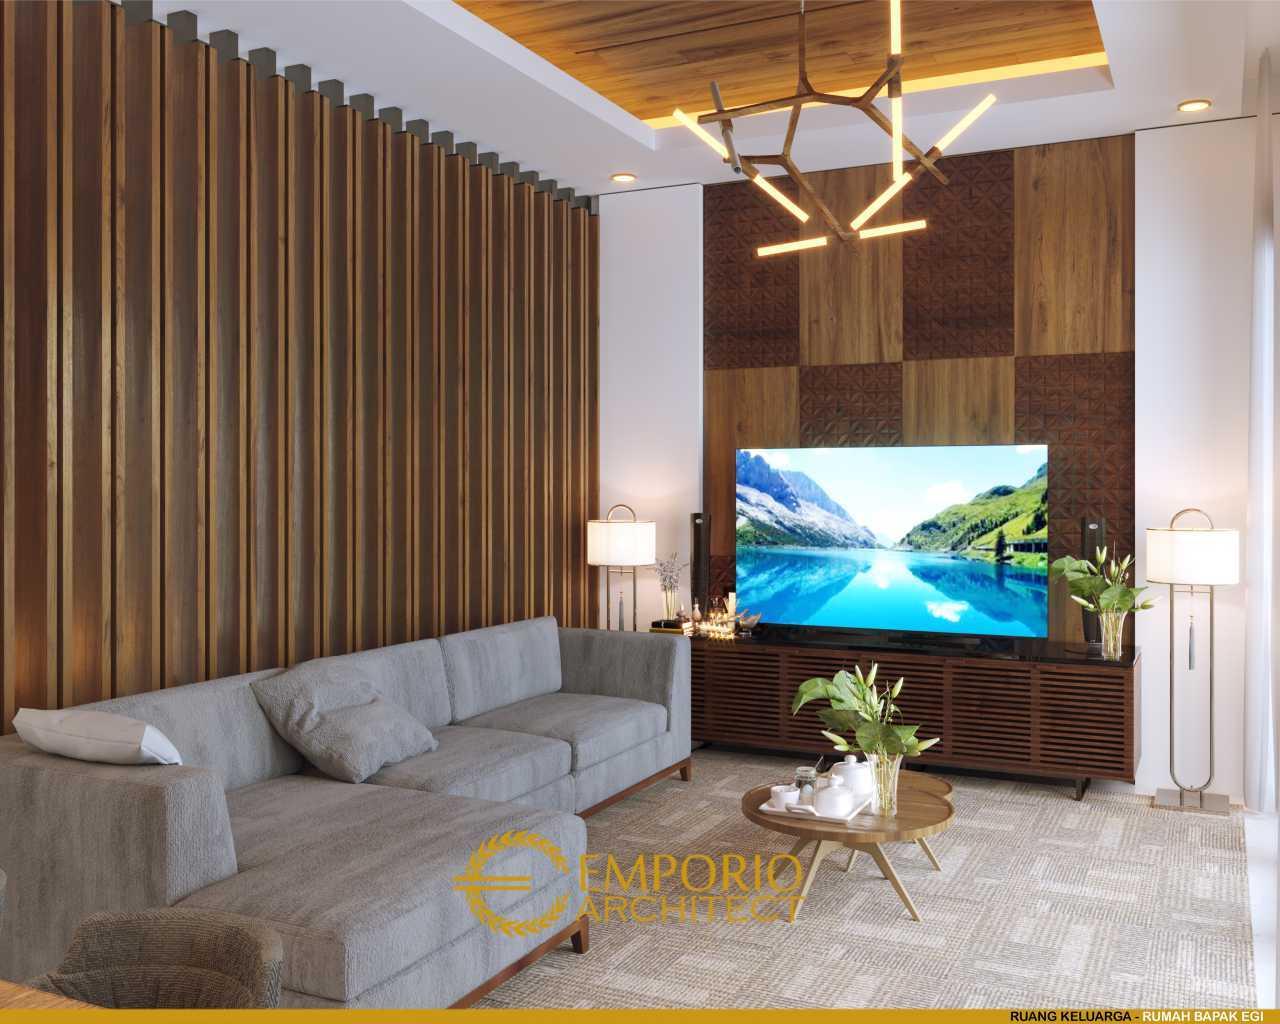 Emporio Architect Jasa Arsitek Denpasar Desain Rumah Modern 3 Lantai 734 @ Denpasar, Bali Kota Denpasar, Bali, Indonesia Kota Denpasar, Bali, Indonesia Emporio-Architect-Jasa-Arsitek-Denpasar-Desain-Rumah-Modern-3-Lantai-734-Denpasar-Bali  93966